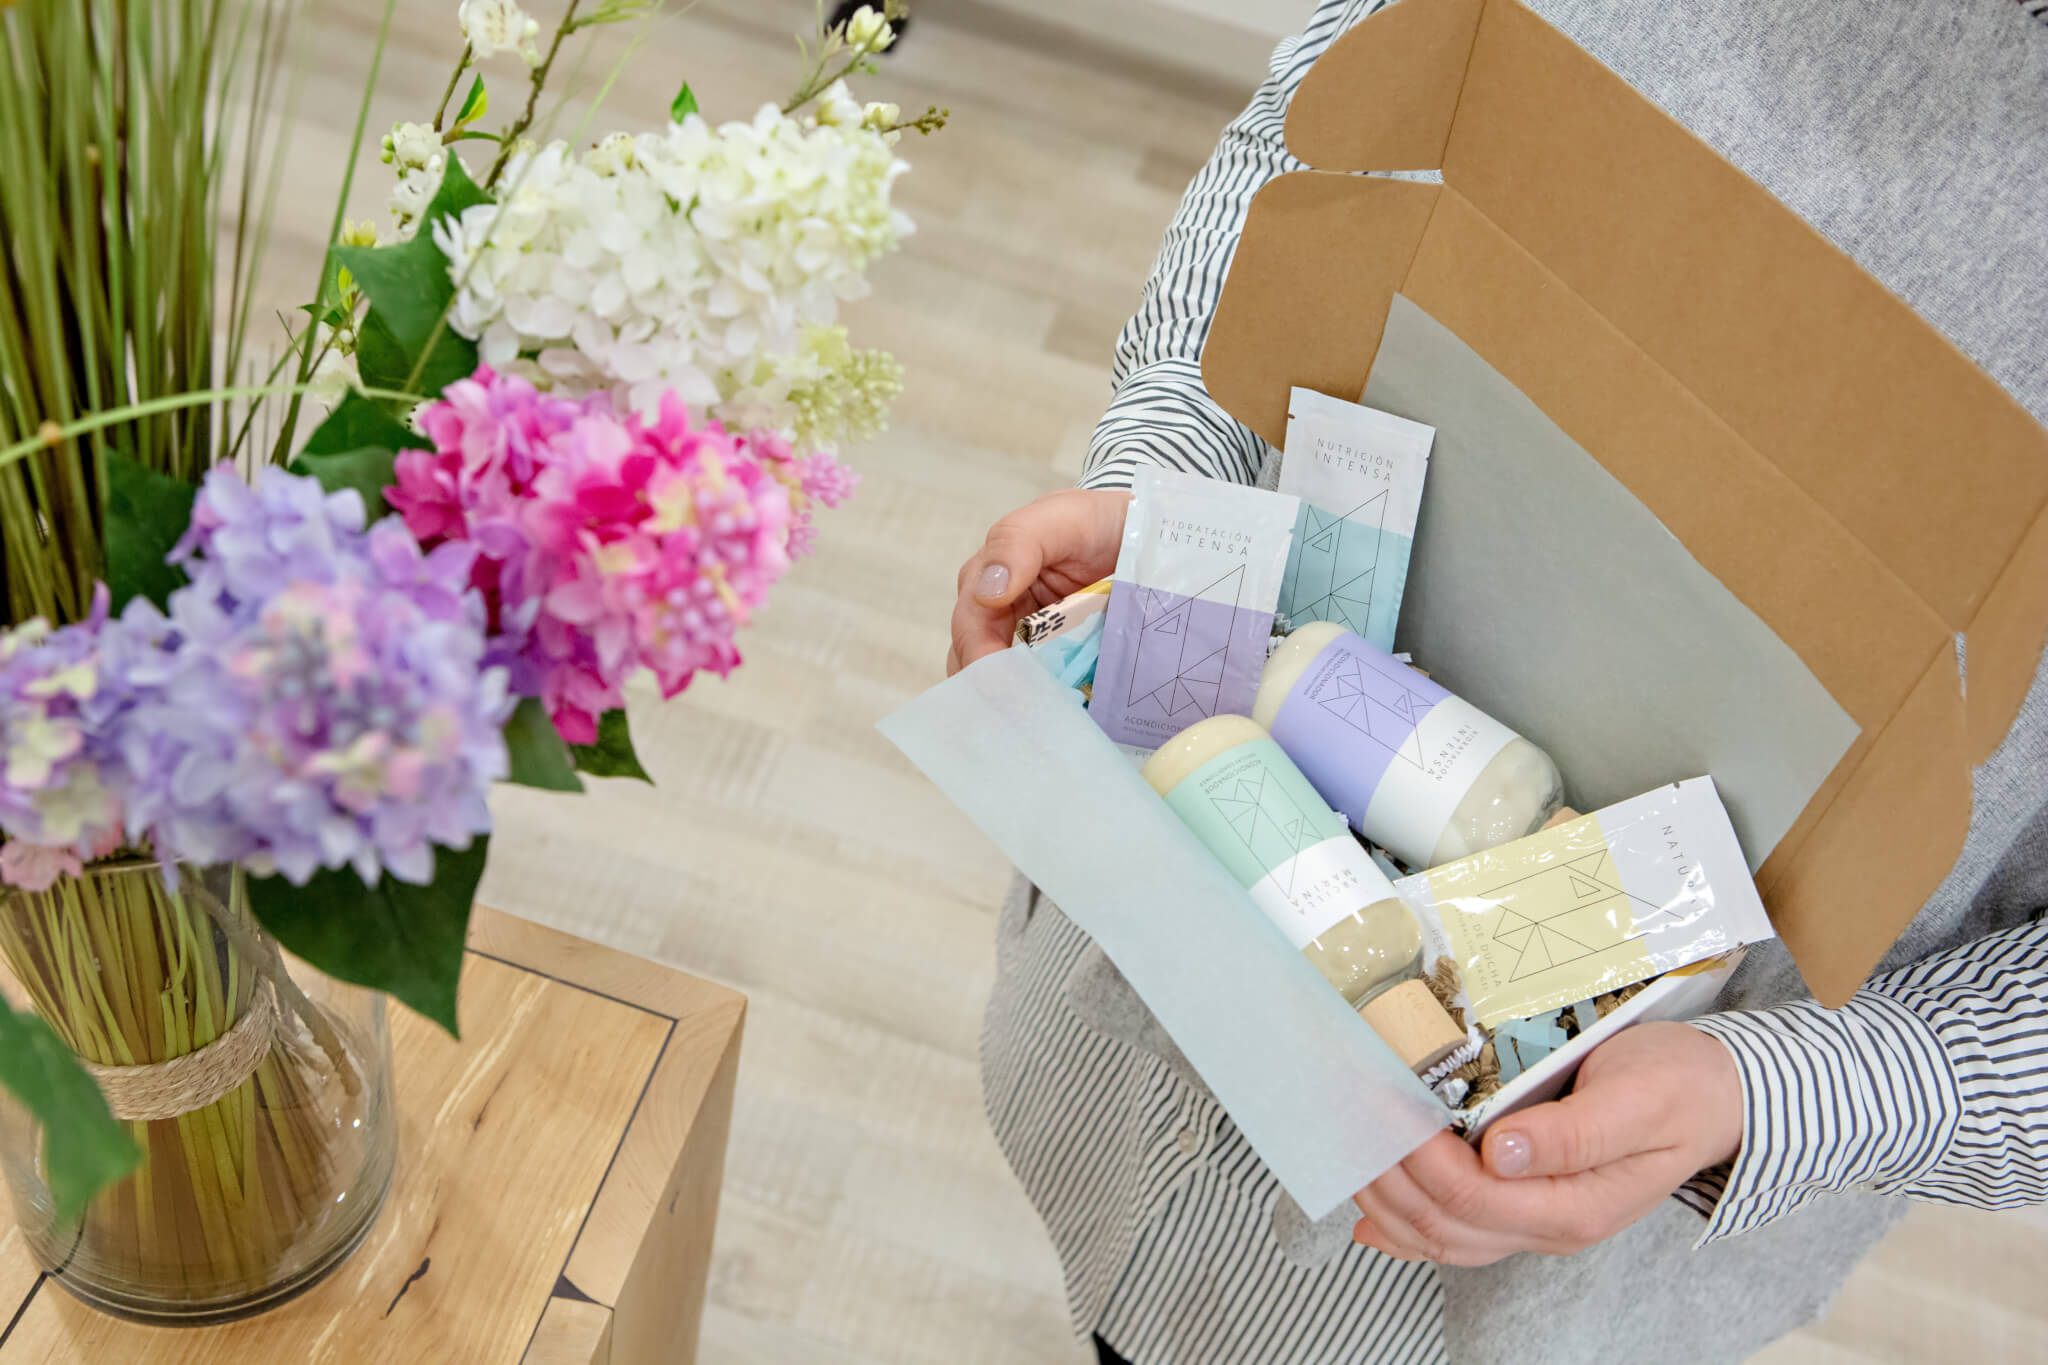 la paqueteria de eco beauty wellness